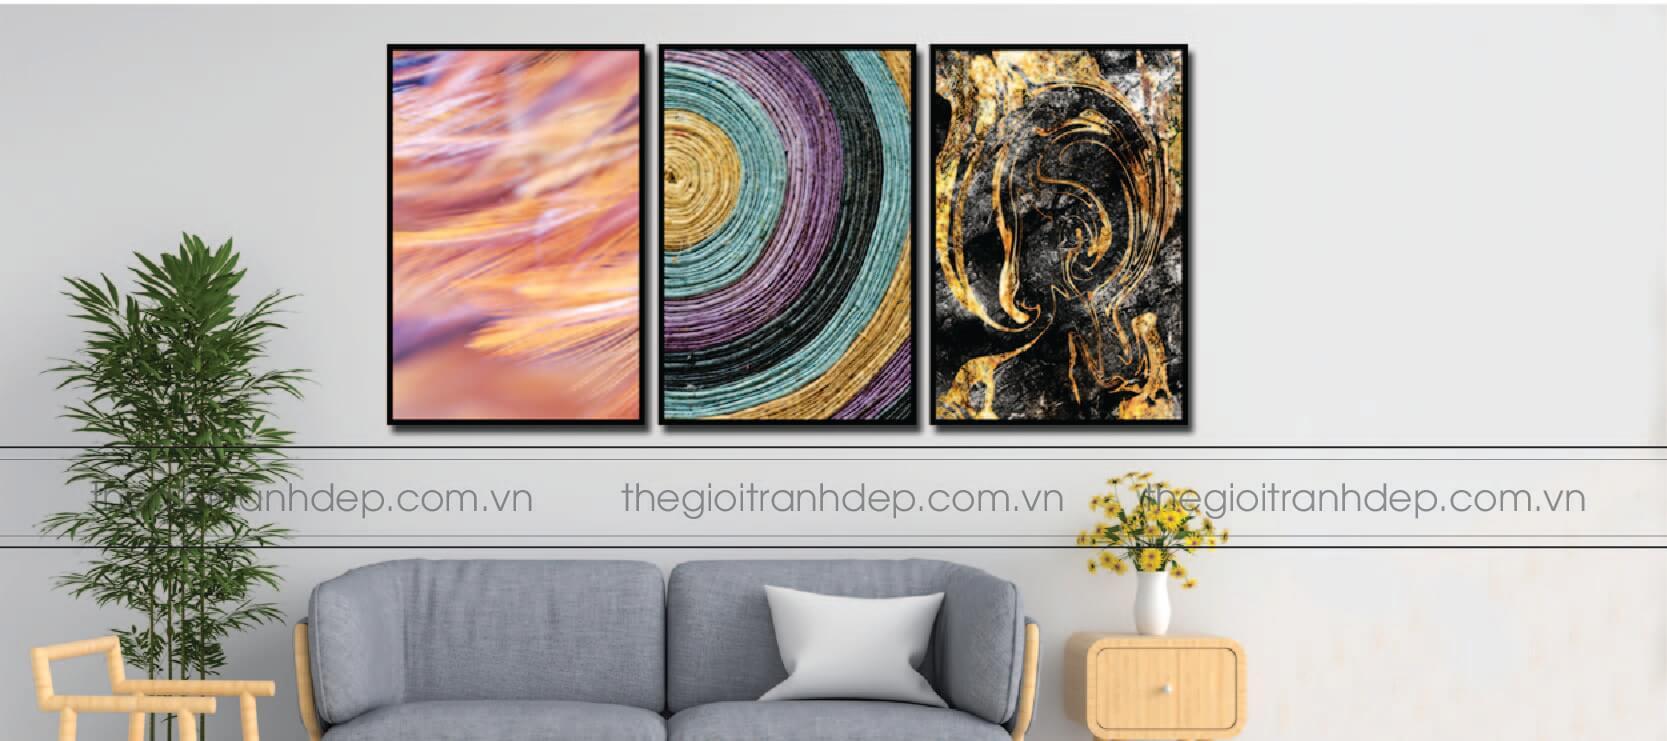 tranh-treo-tuong-canvas-dep-10